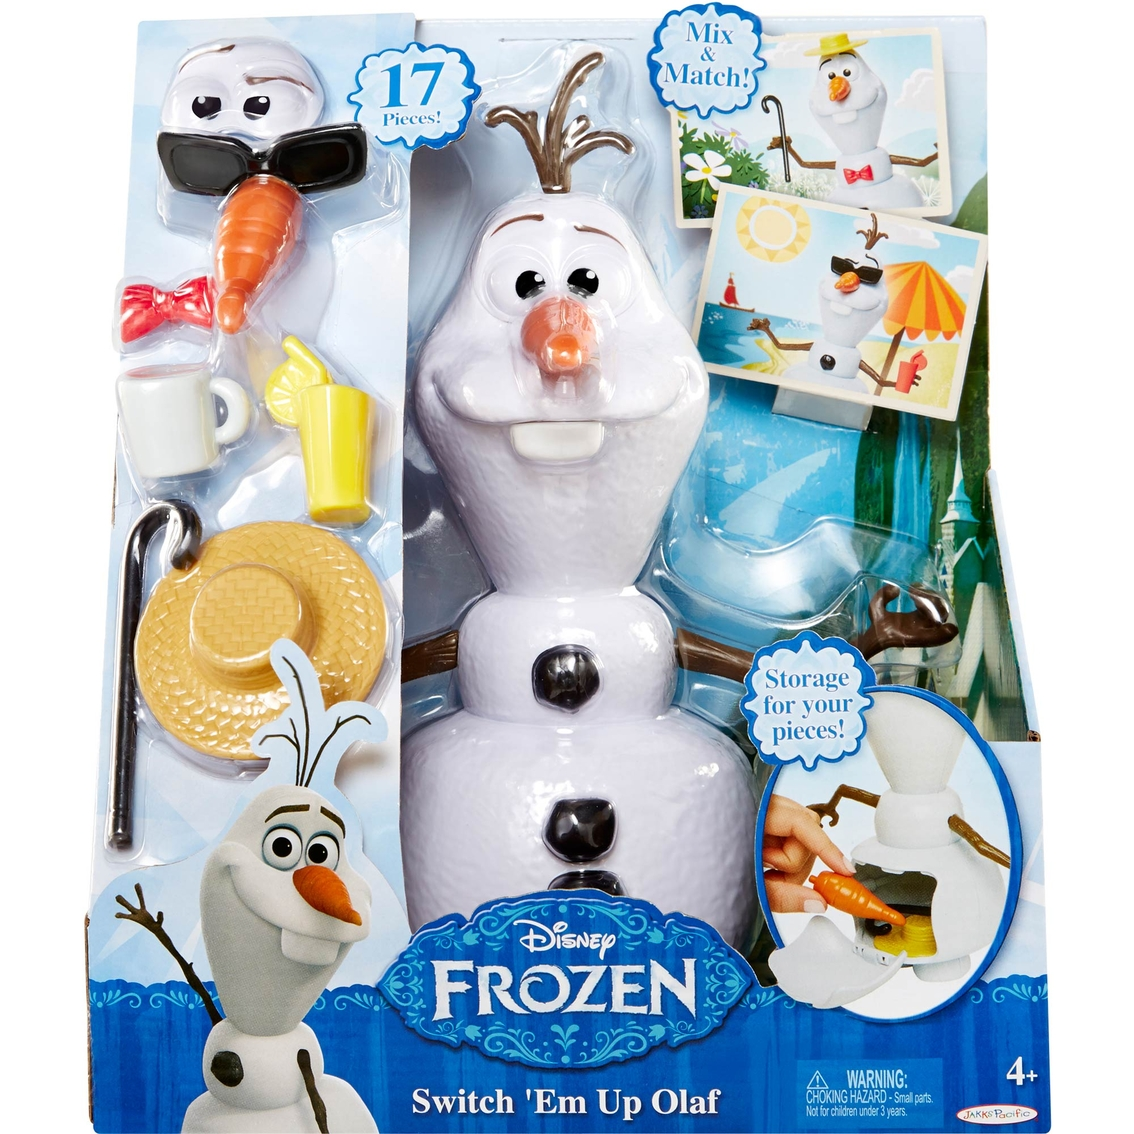 Switch It Up Toys : Disney frozen switch em up olaf doll toys shop the